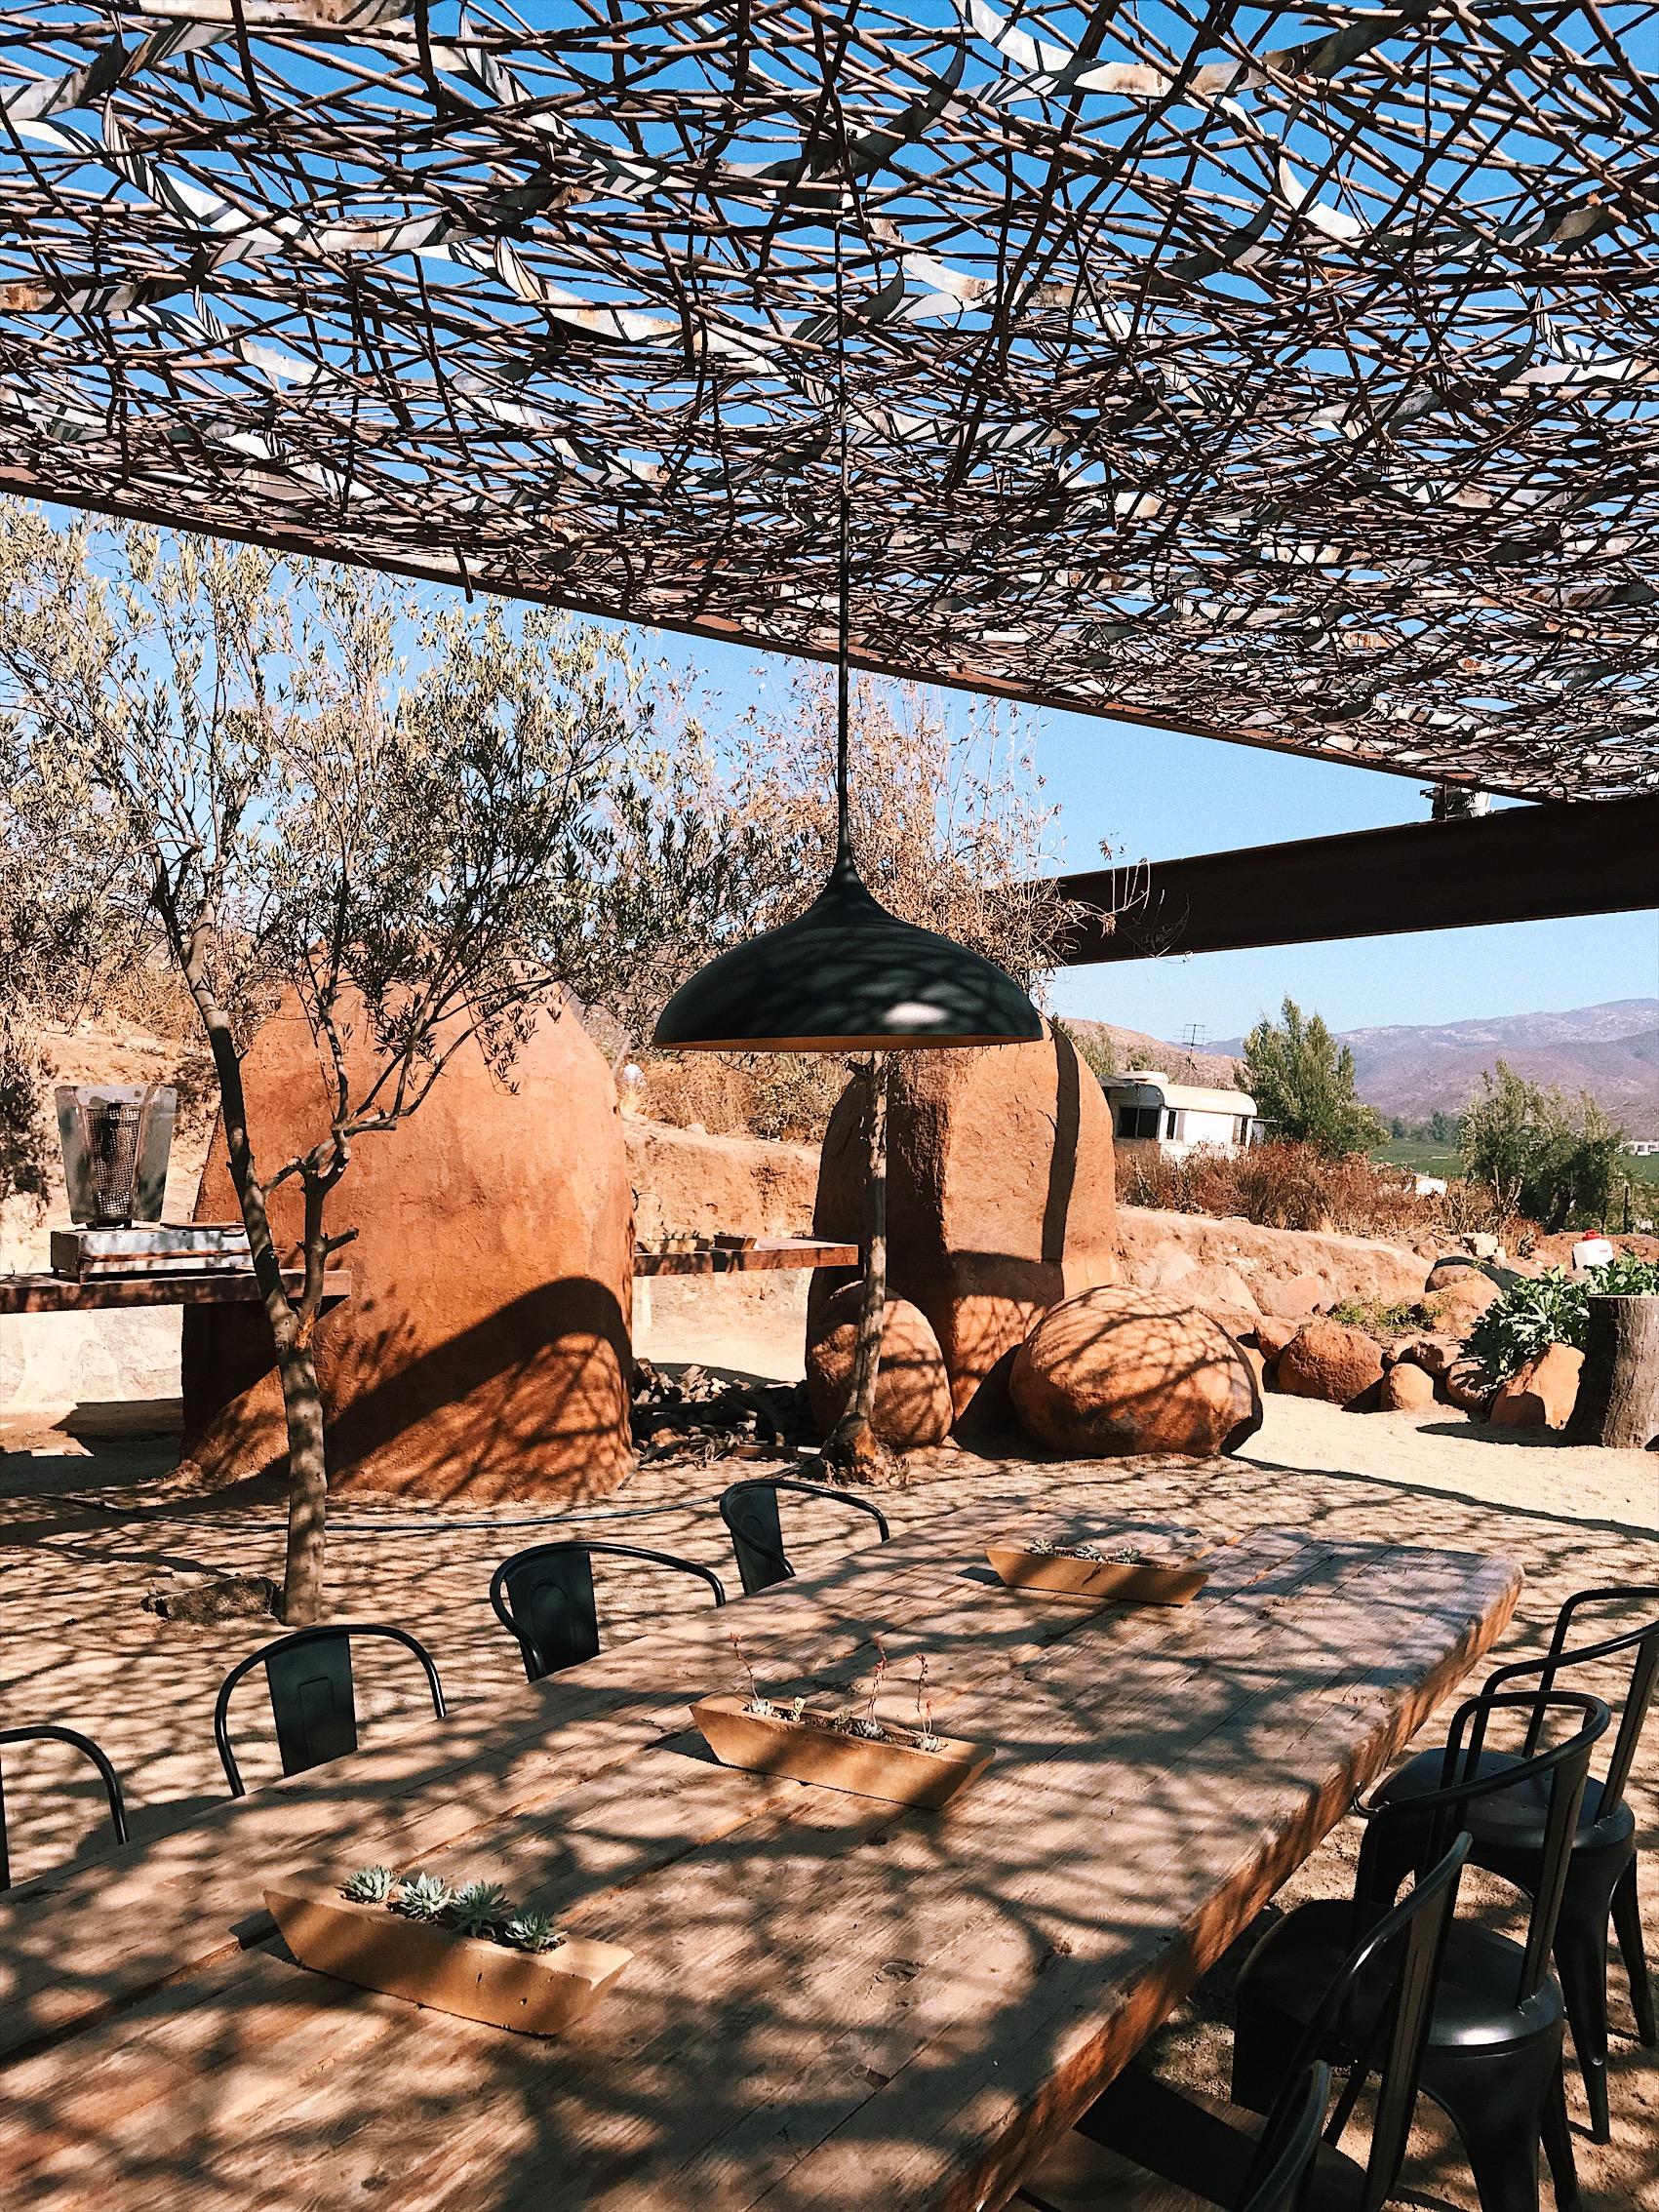 acme real estate interior blog road trip los angeles valle de guadalupe Deckman's at El Mogor Restaurant in Valle de Guadalupe | Ensenada | Valle Food — With Love, Paper and Wine